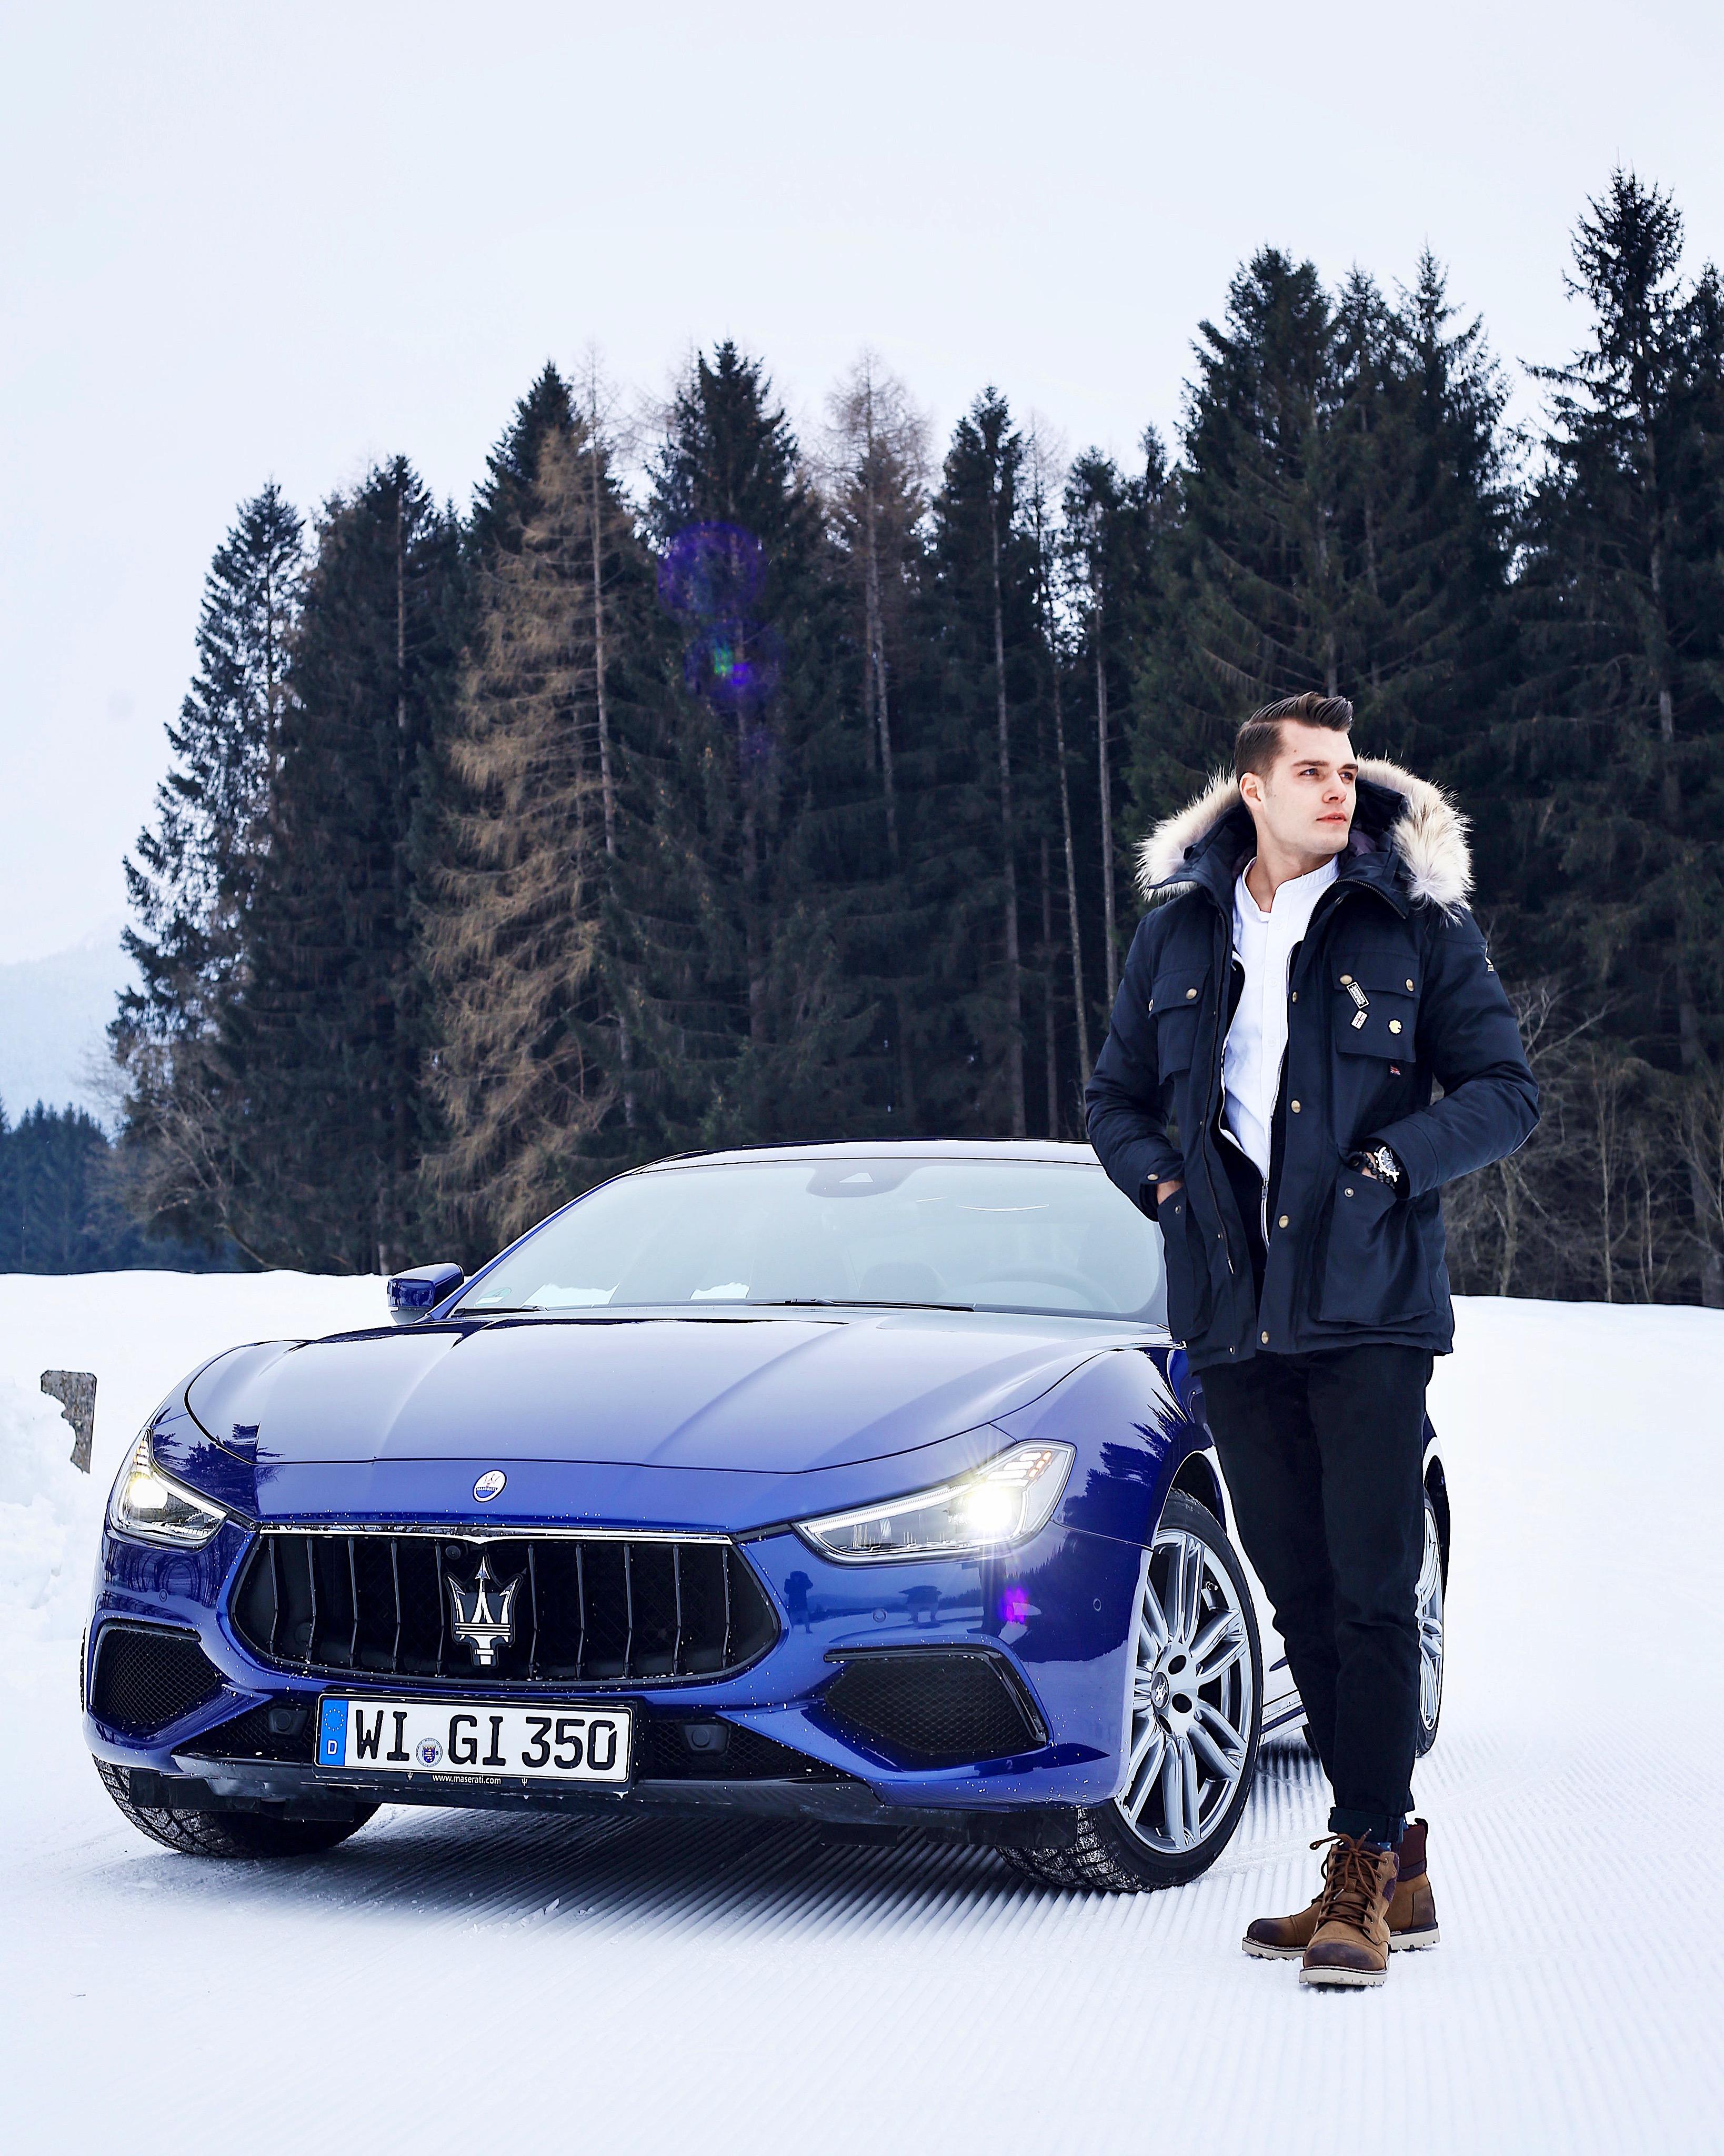 Maserati Tour Saalfelden @felixfr98